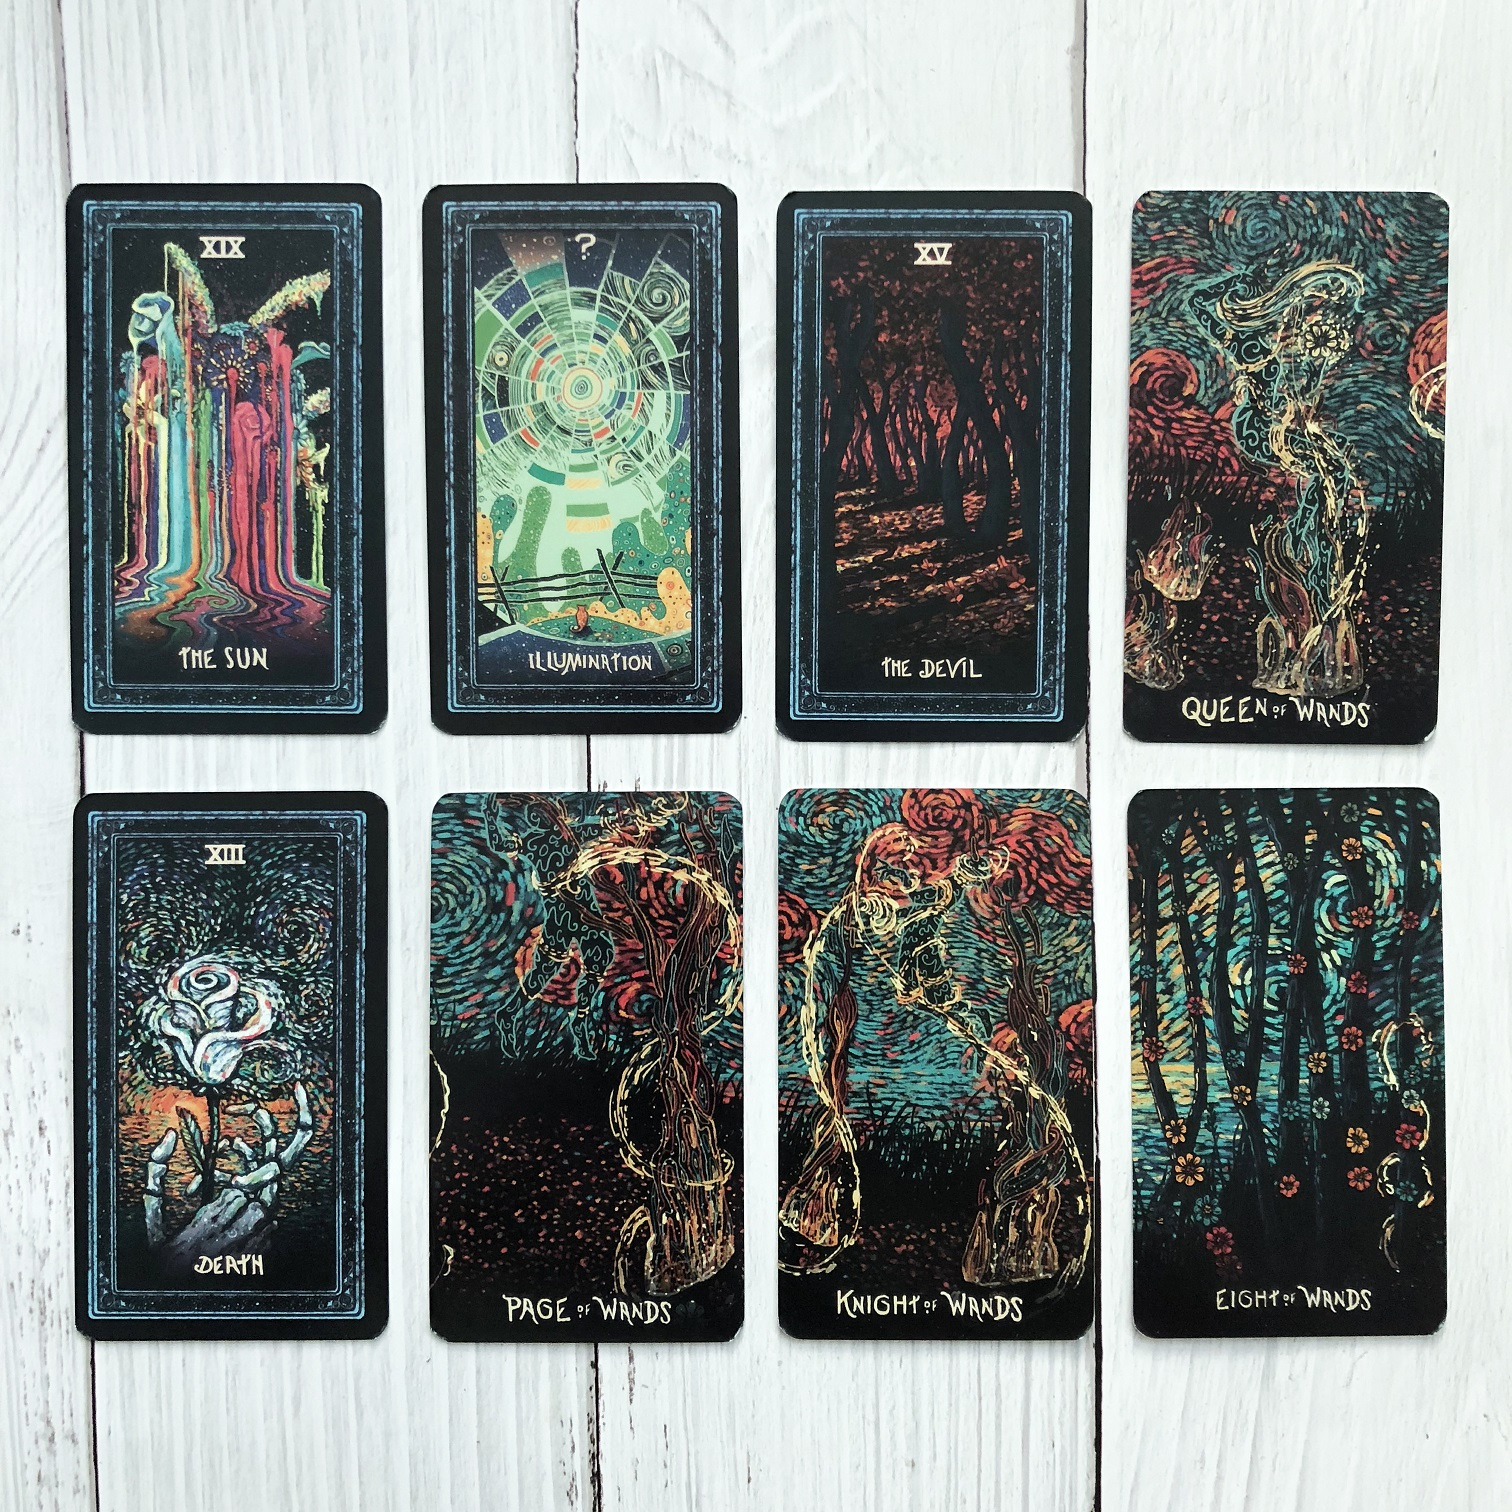 78+1Pcs English DIY Silver Plating Prisma Visions Tarot Board Game Tarot Cards Deck Divination